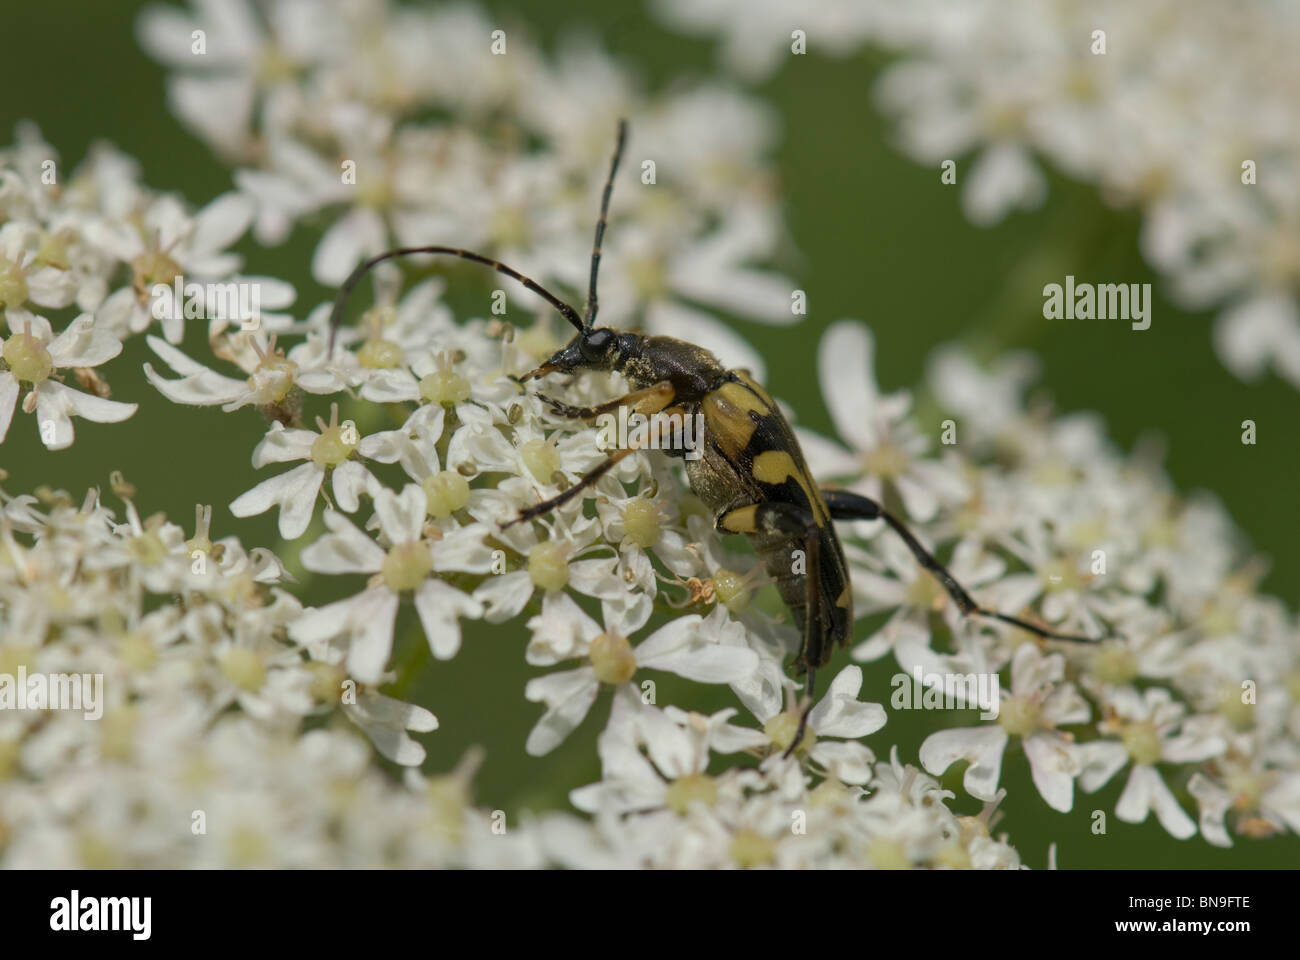 A longhorn beetle (Leptura maculata, (?) wasp mimic - Stock Image